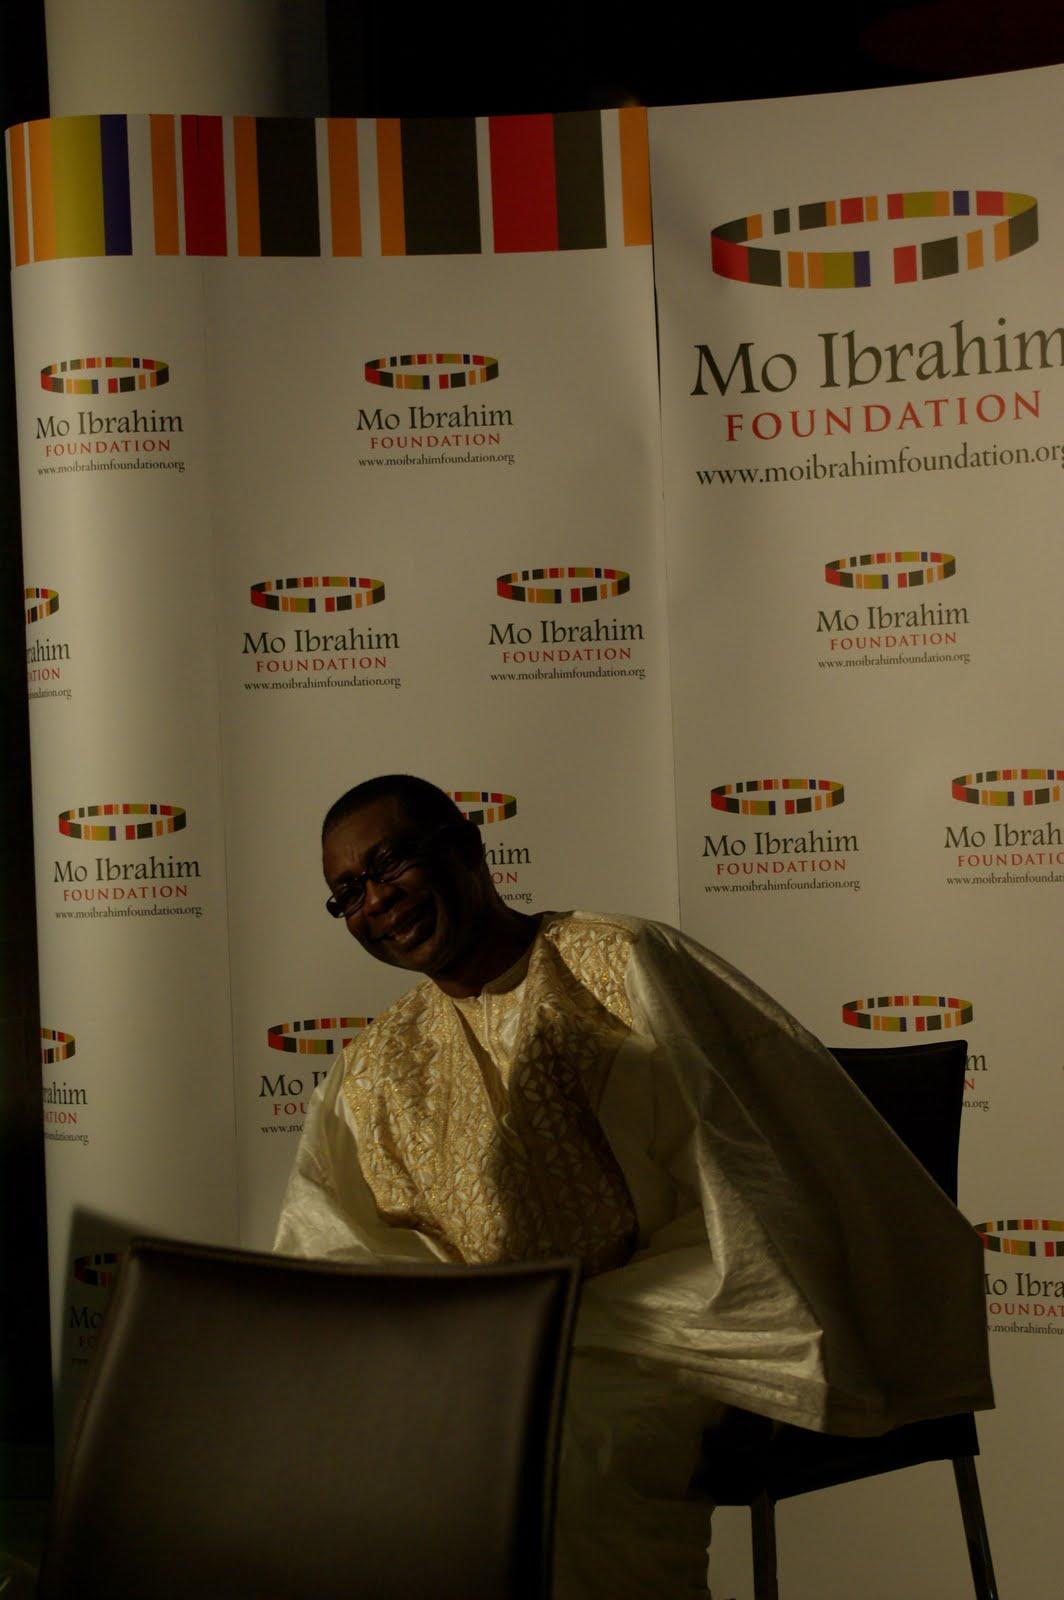 ubuntu platform  mo ibrahim foundation event in tanzania